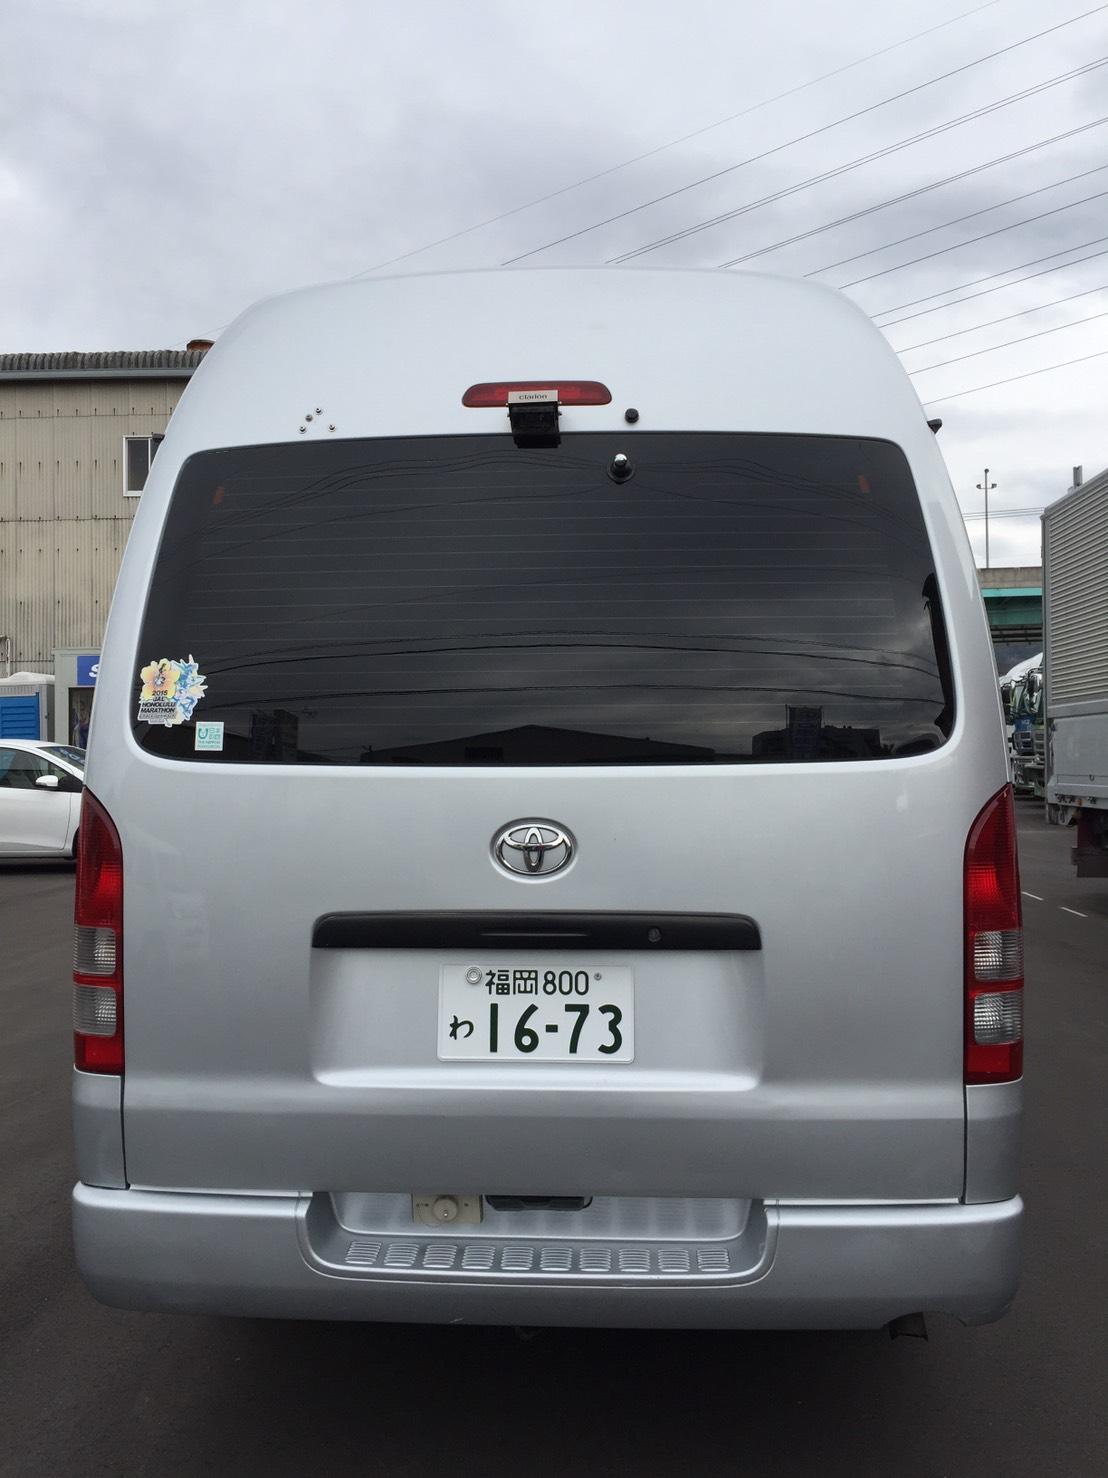 http://rental-campingcar.com/blog/S__17457158.jpg